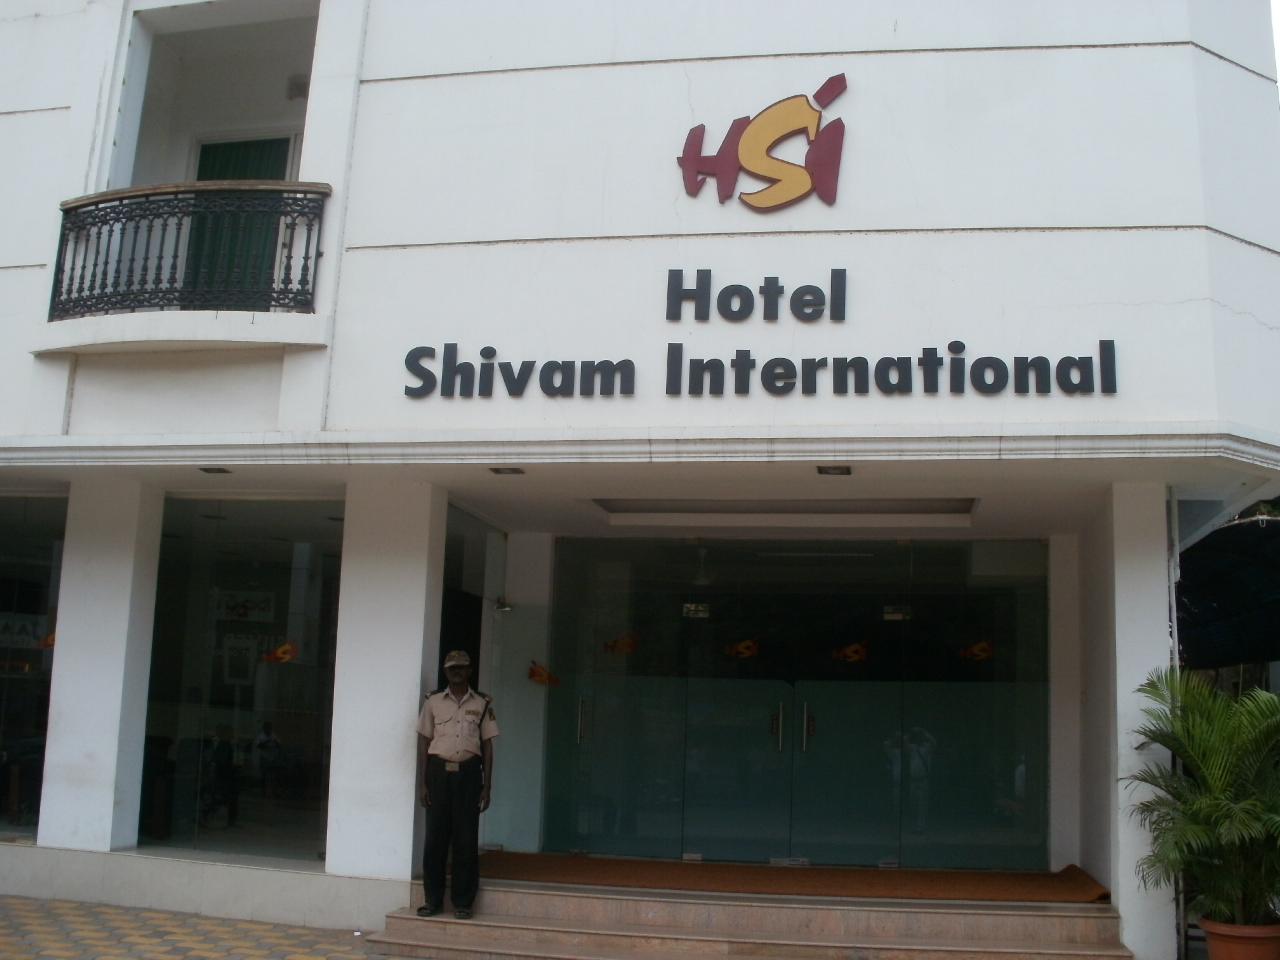 Hotel Shivam International in nellore